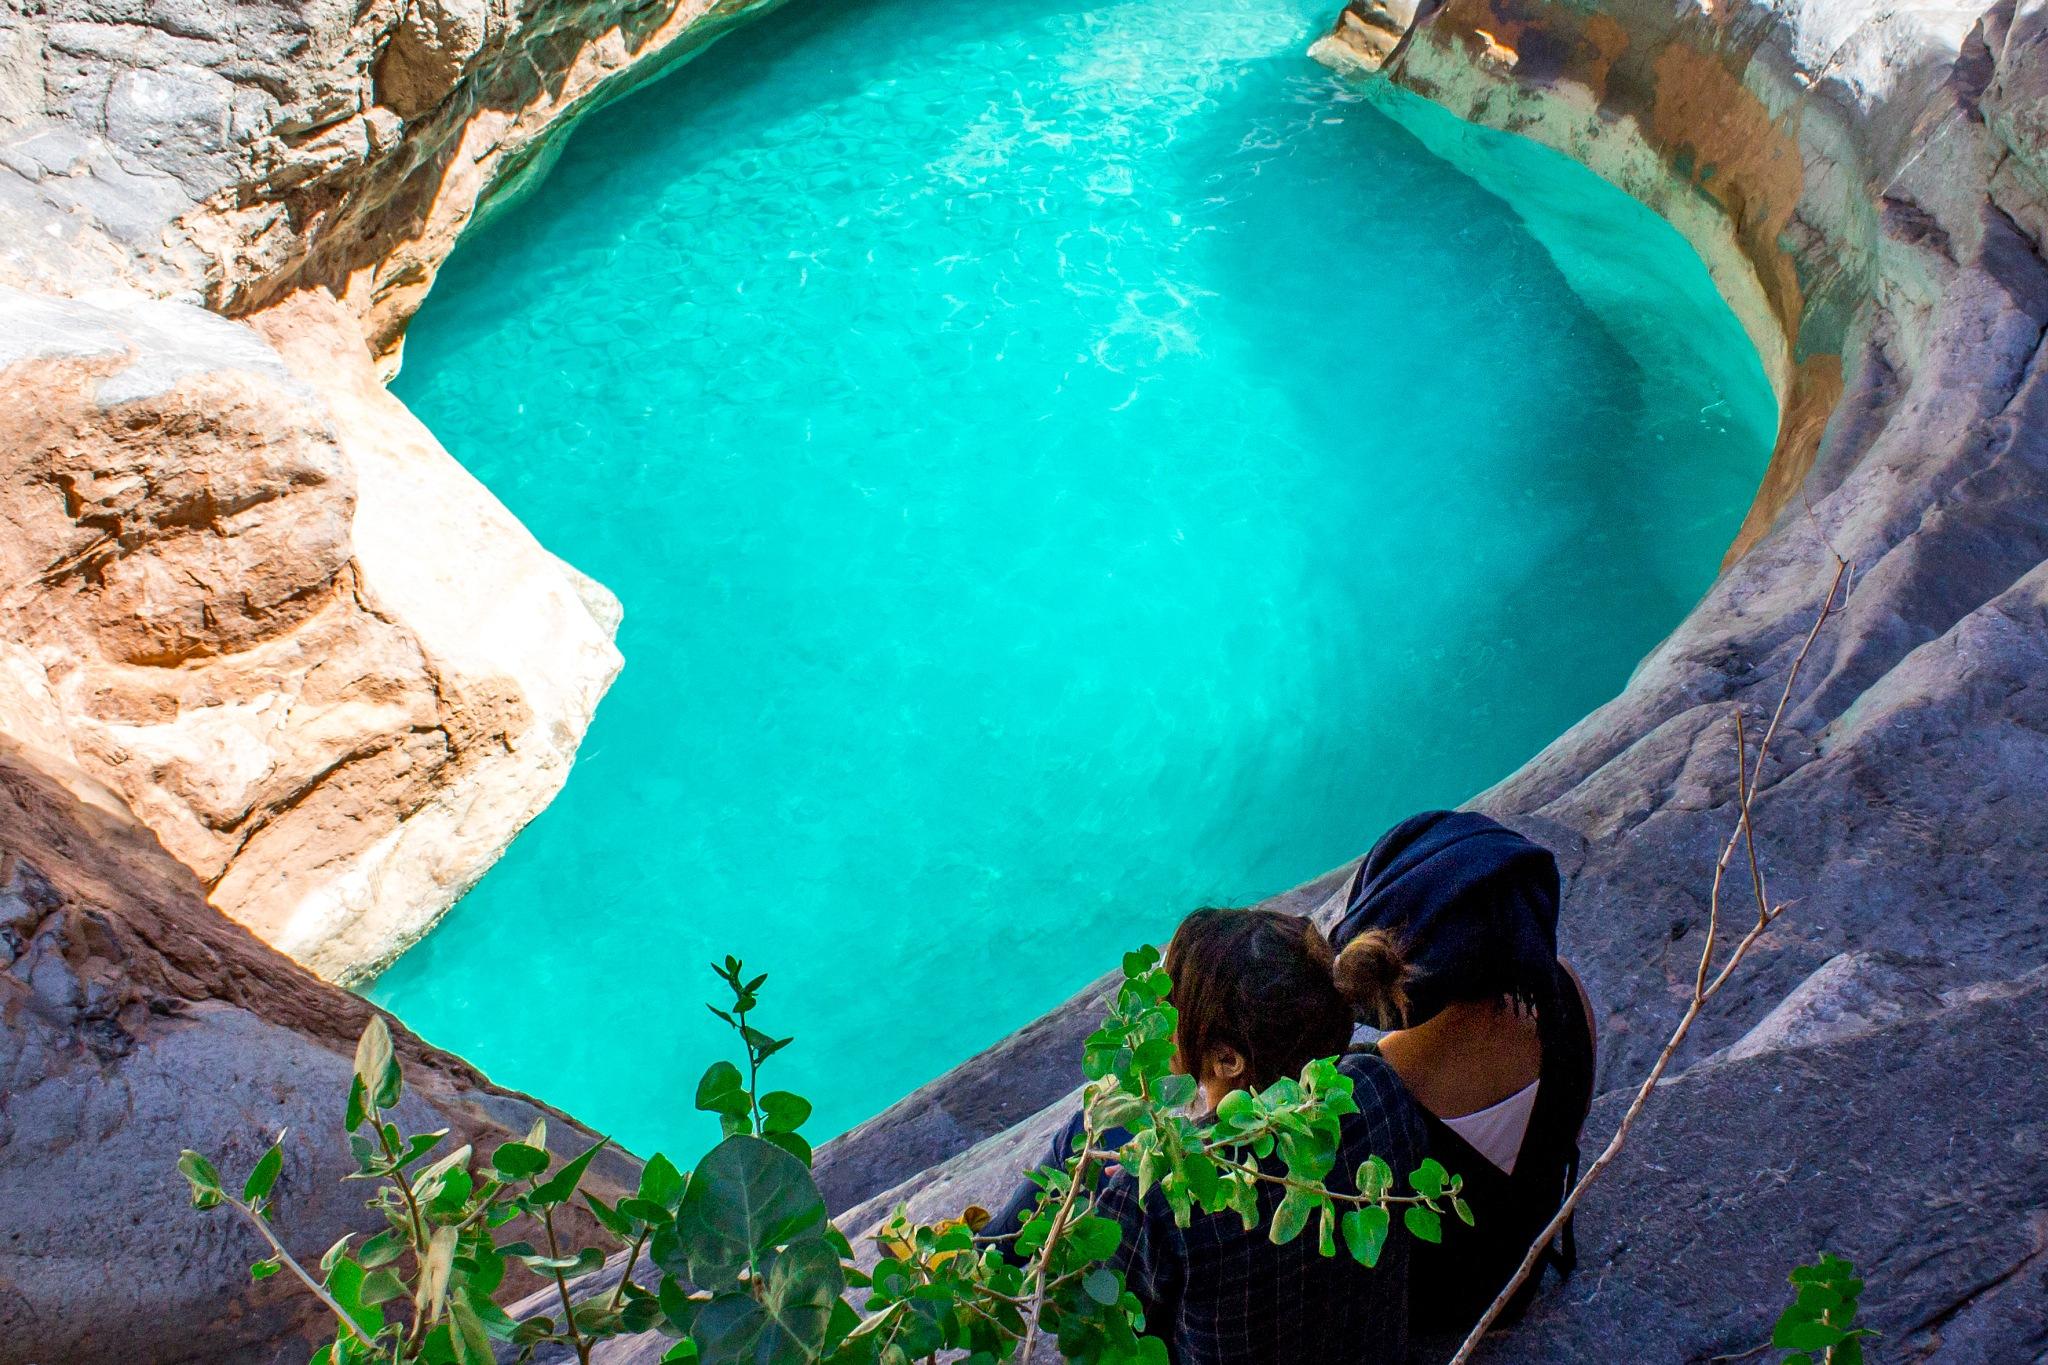 Paradise by Youness Fakoiallah